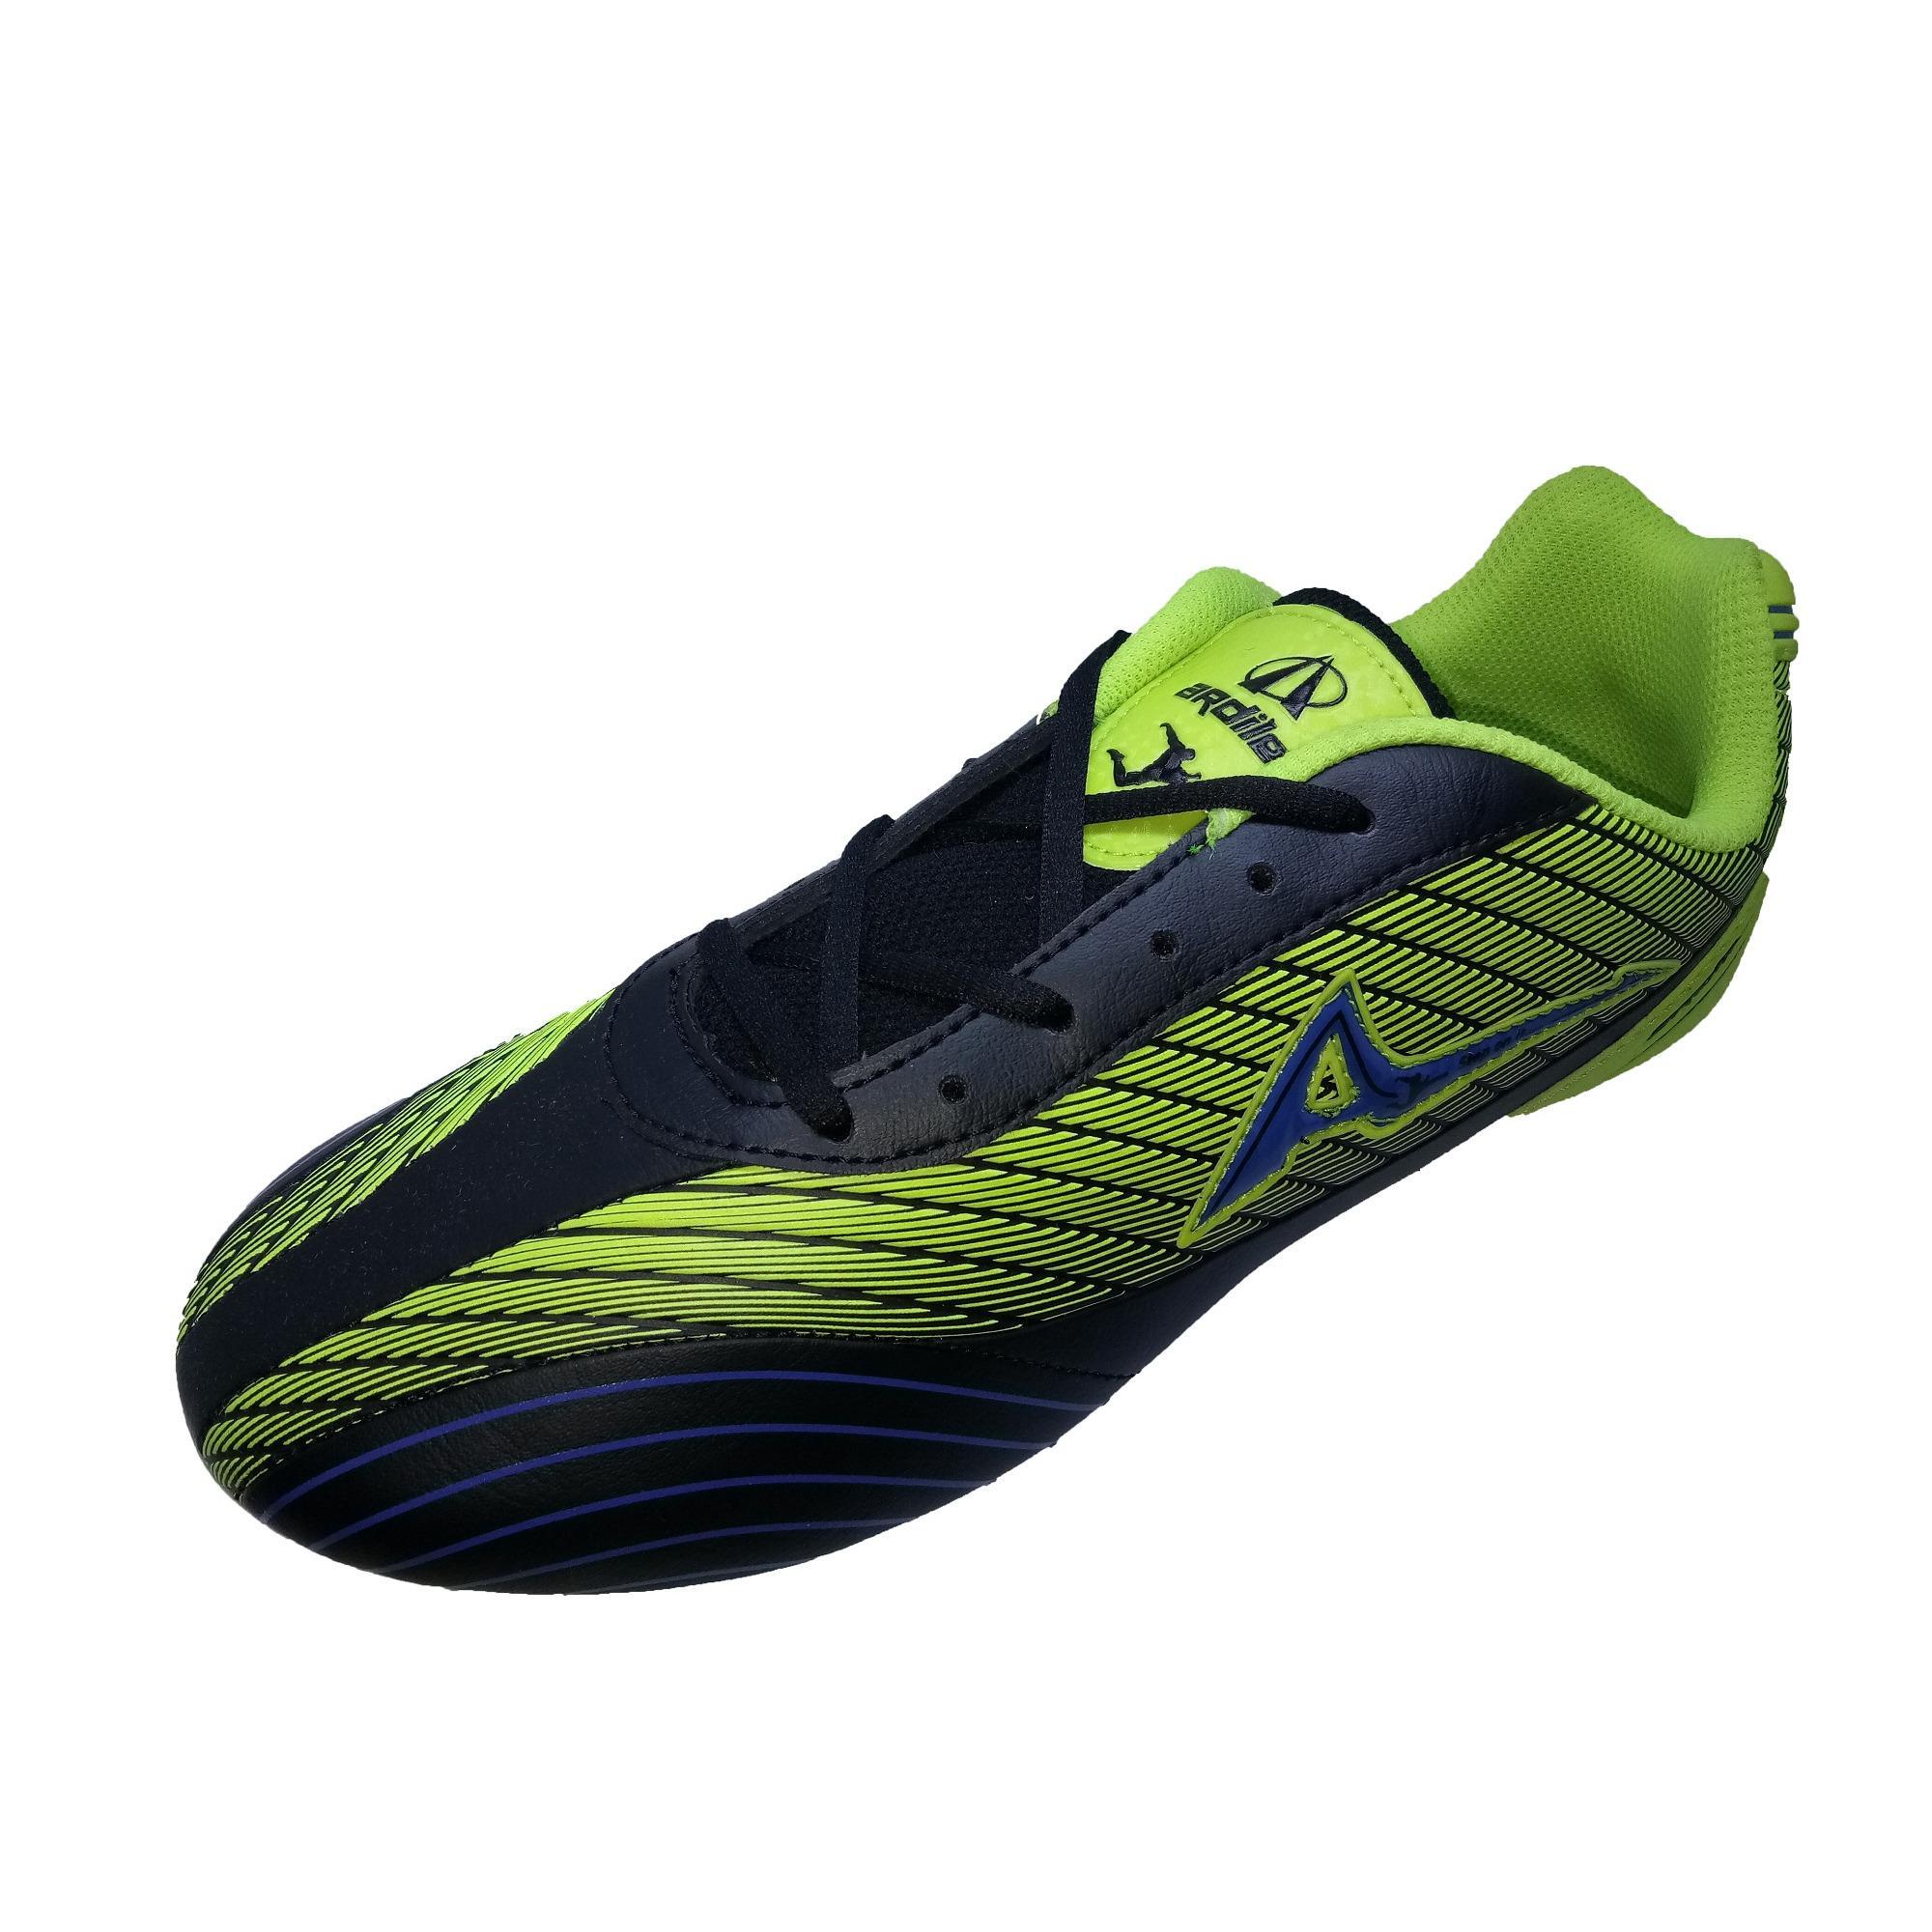 Sepatu Ardiles Futsal - Sepatu Futsal - Sepatu Olahraga - Sepatu Lari - Sepatu Jogging - Sepatu Pria - Sepatu Wanita - Sepatu Anak - Sepatu Murah - Sepatu Sneakers - Sepatu Casual